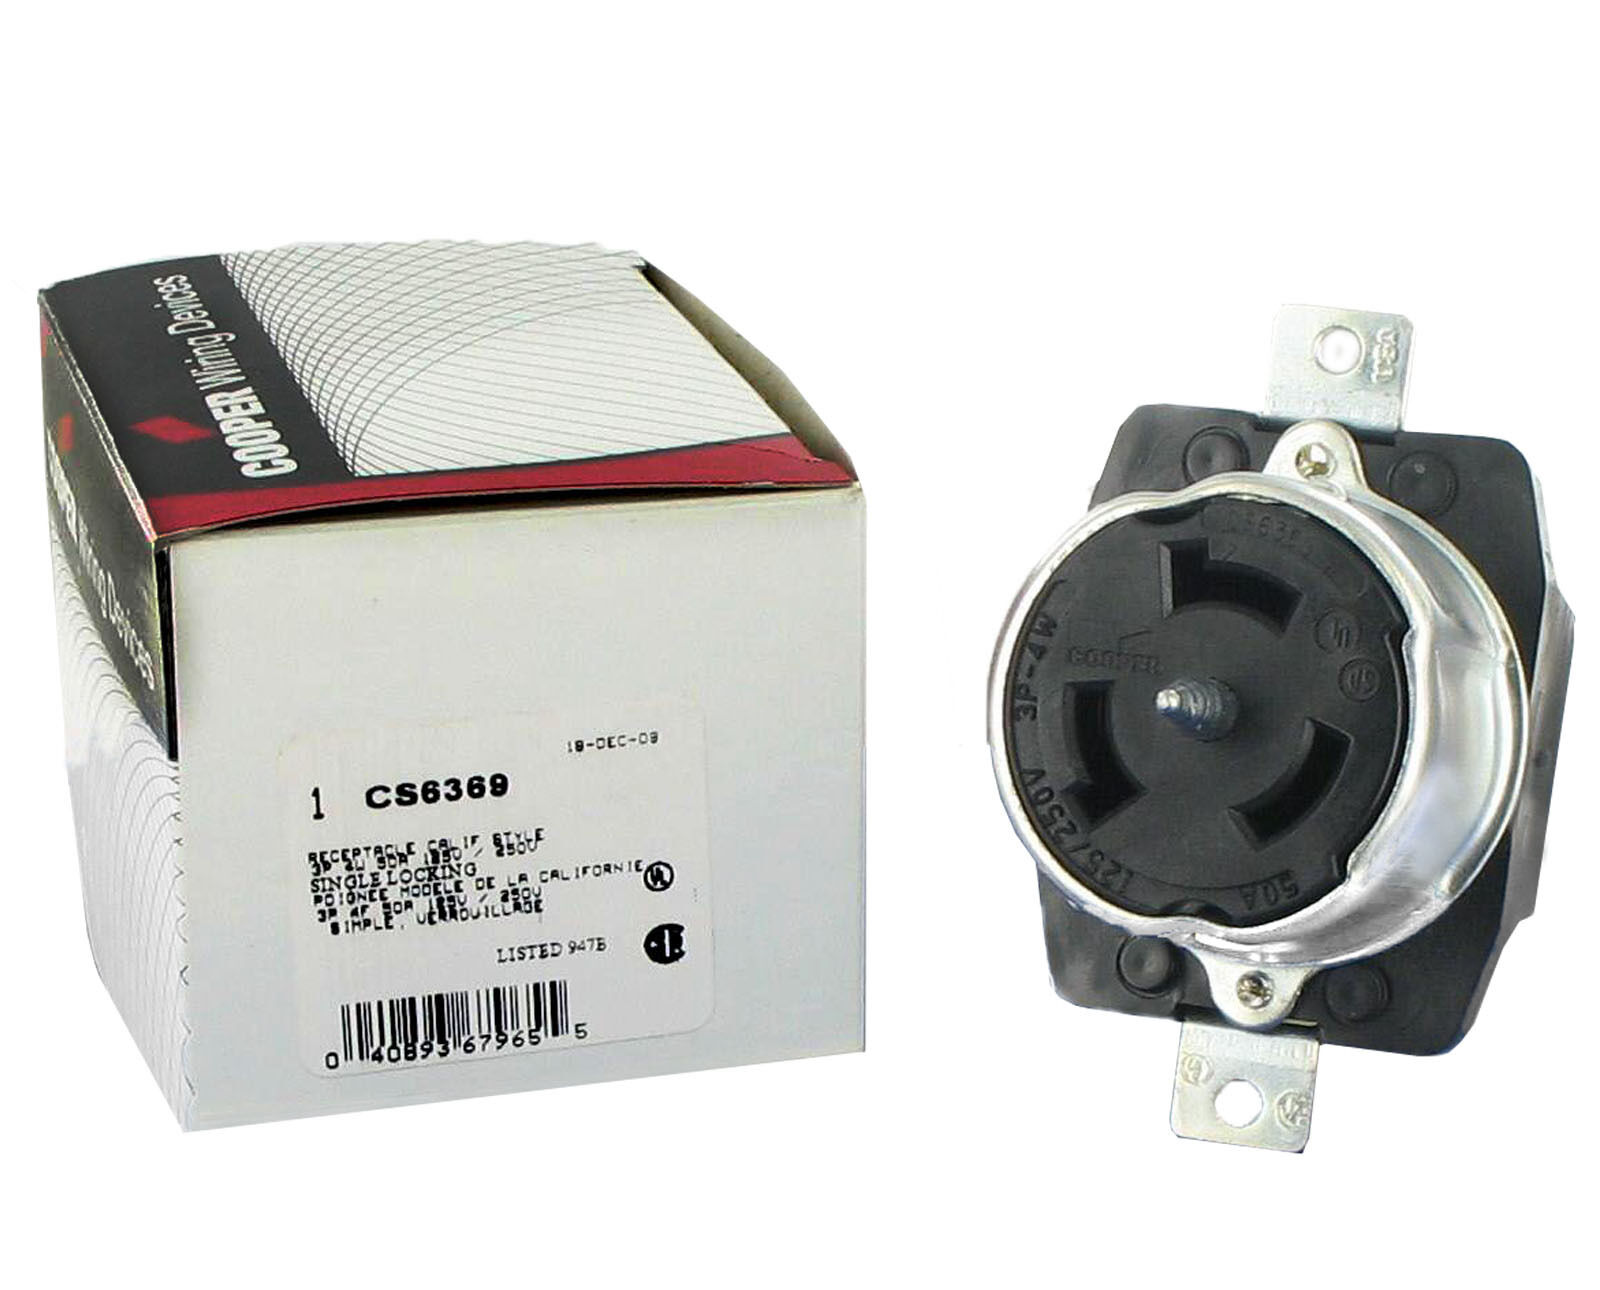 Arrow Hart Div Cooper CS6369 3 Pole 4 Wire 50a 125/250v Locking Receptacle